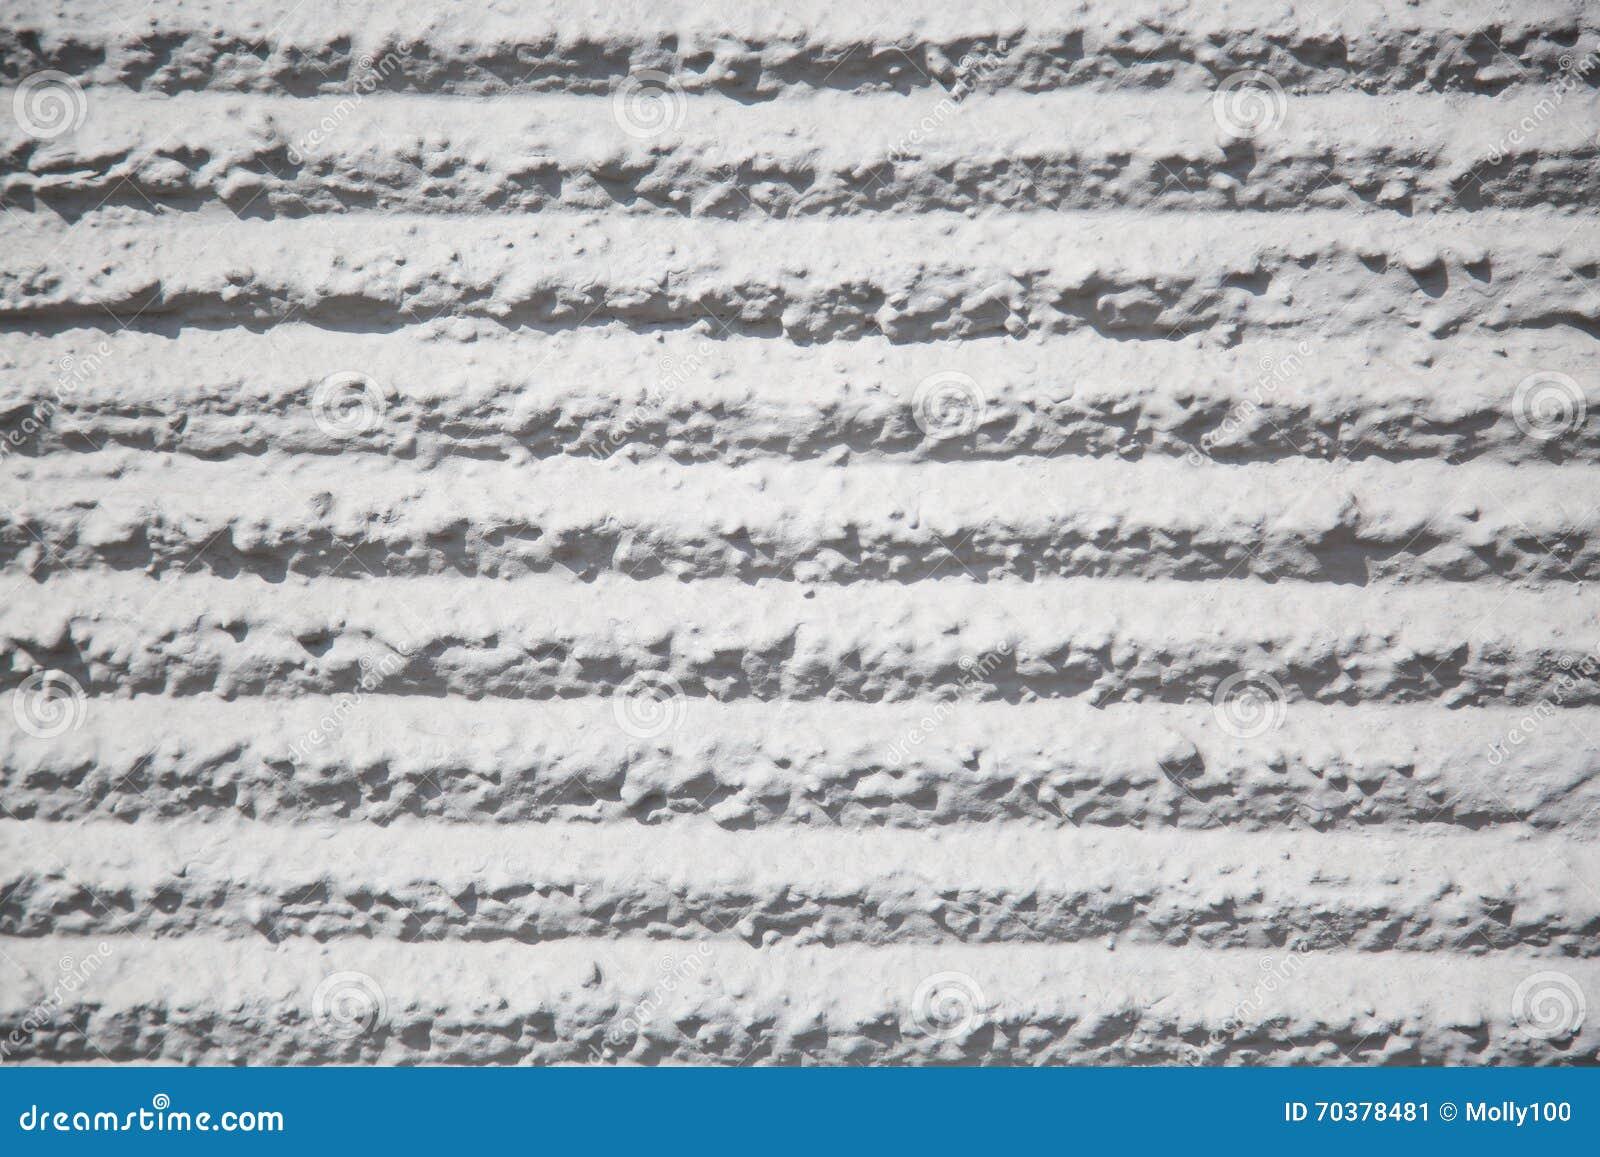 Alte wand im grau tapete fassade stockfoto bild 70378481 for Wandtapete grau